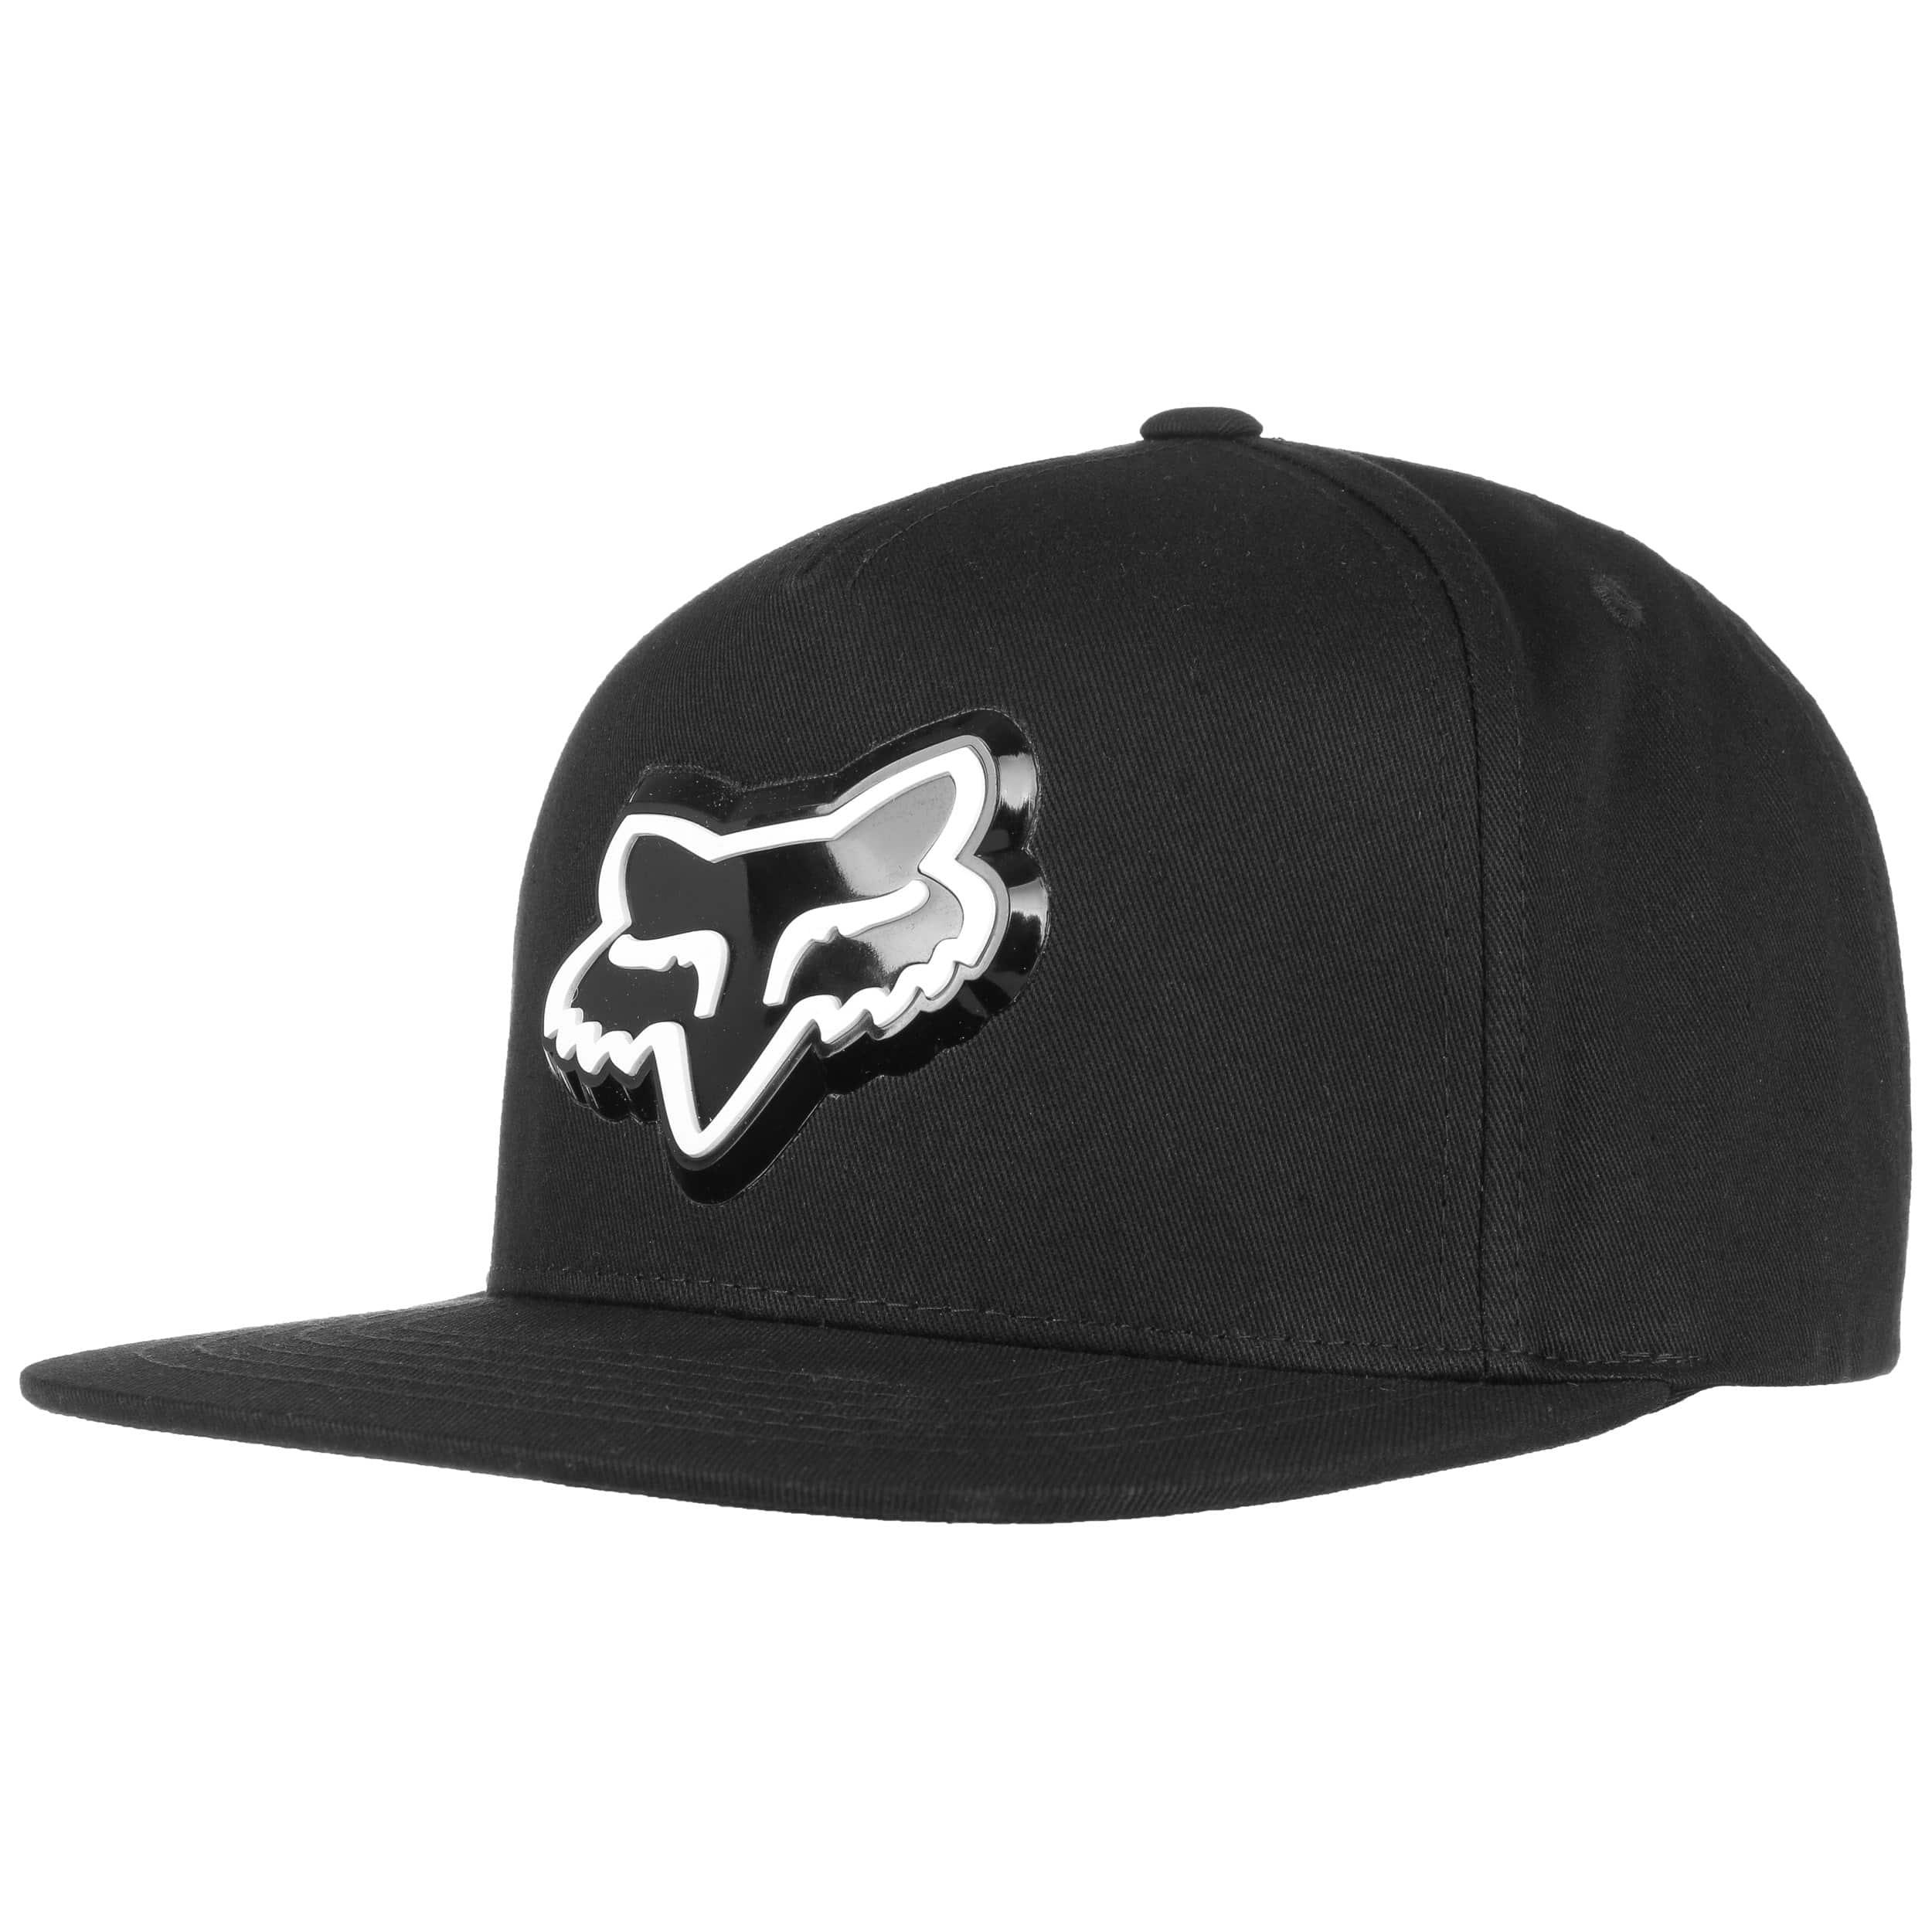 afd479cb8445 Ingratiate Snapback Cap by FOX, EUR 29,95 --  Hats, caps   beanies ...